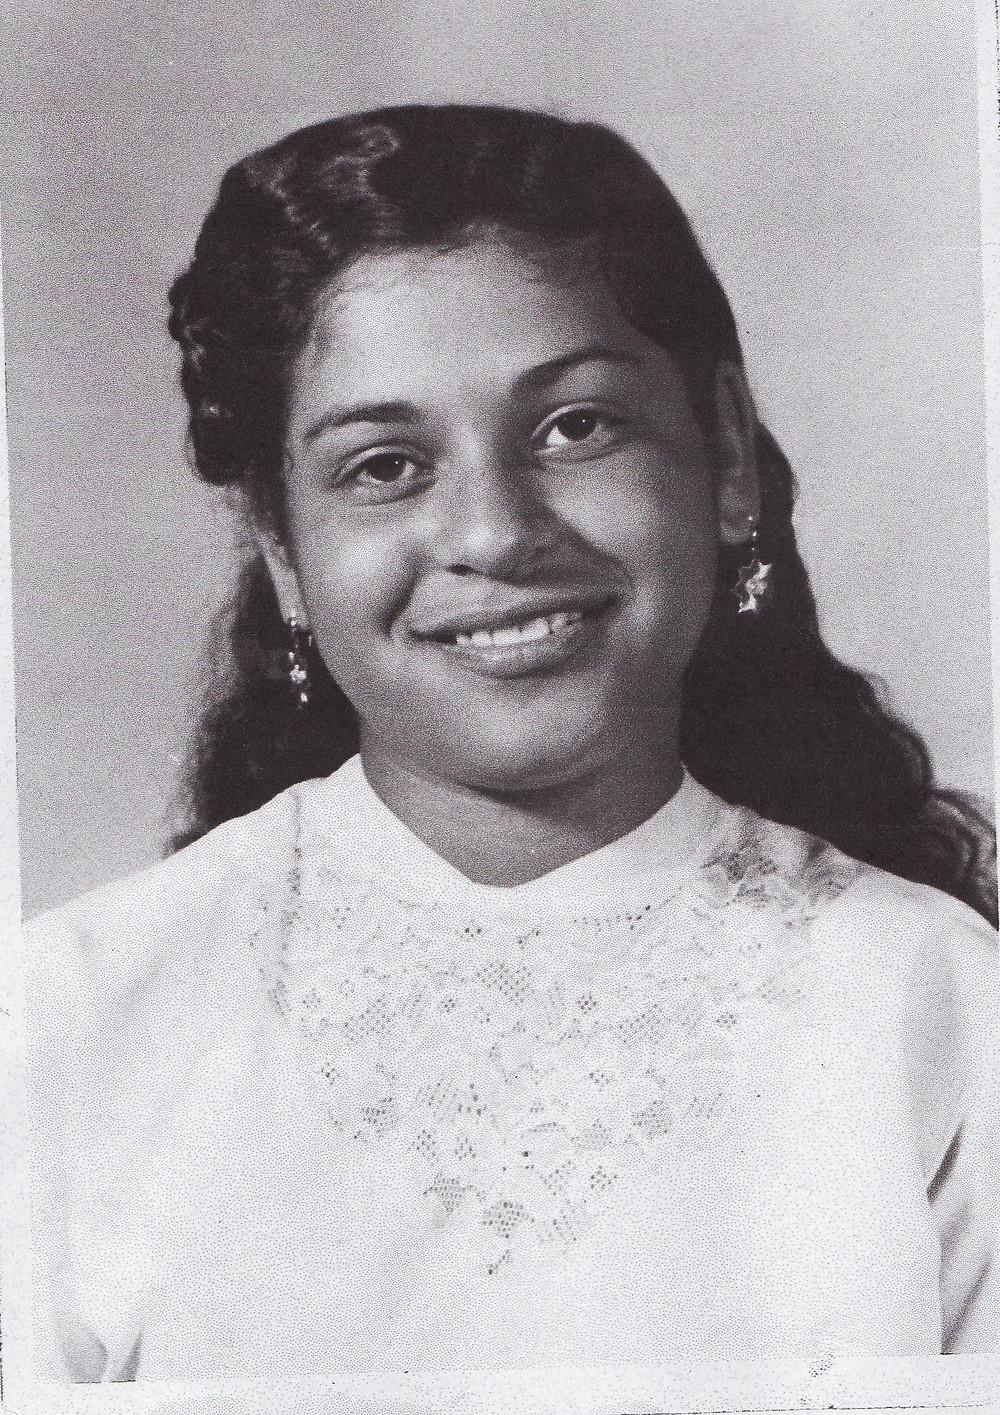 My grandmother, Seraphine O. Ferguson